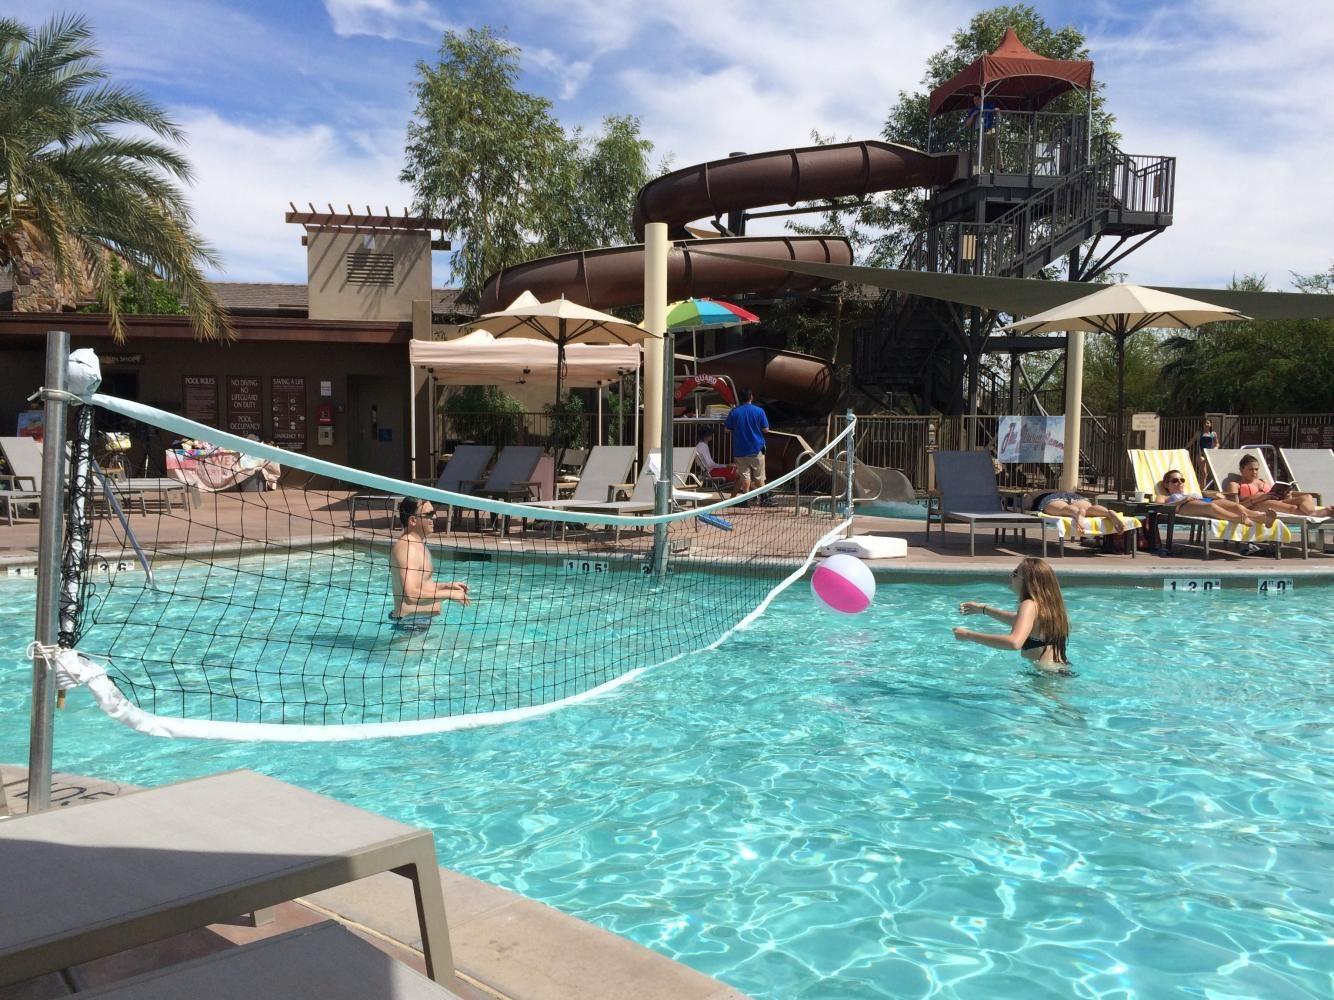 Summer fun in Palm Springs, California.